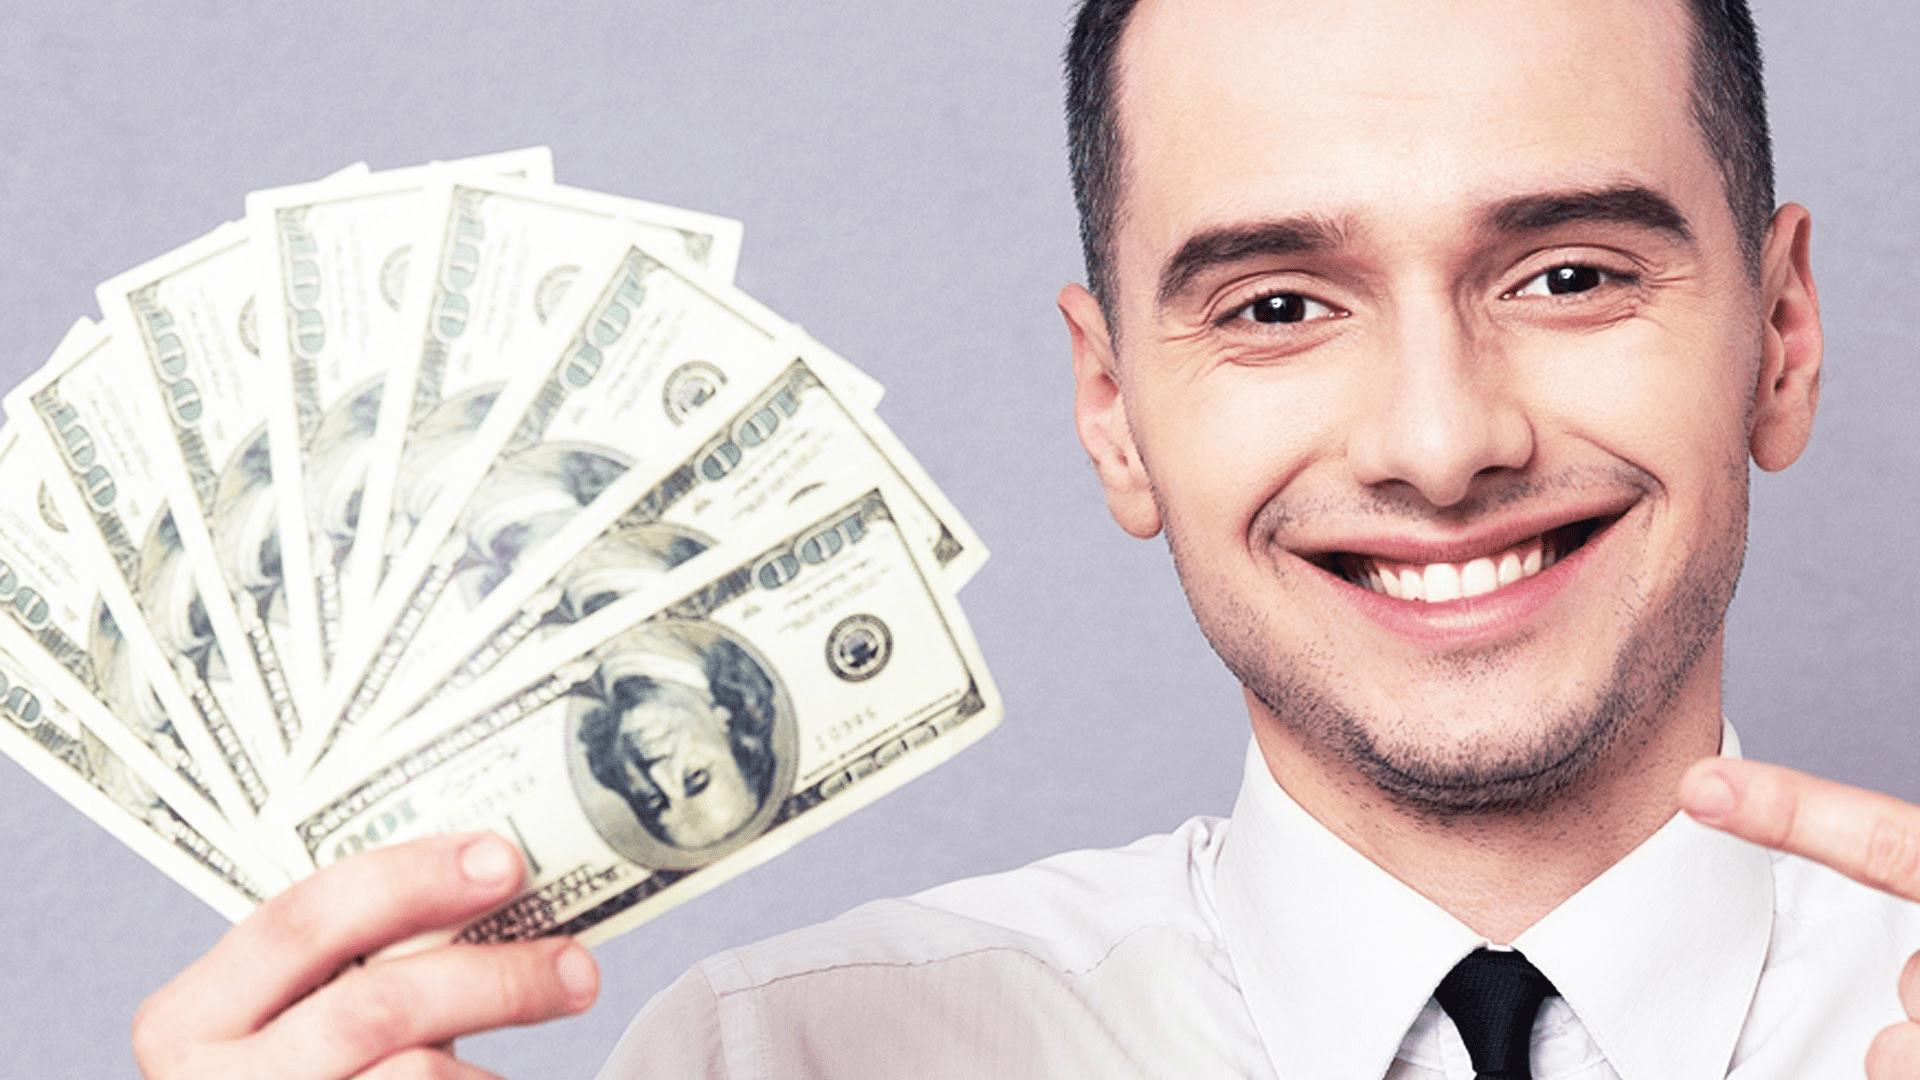 25 Fool-Proof Ways to Make 500 Dollars Fast (method 2 takes 3 minutes!)